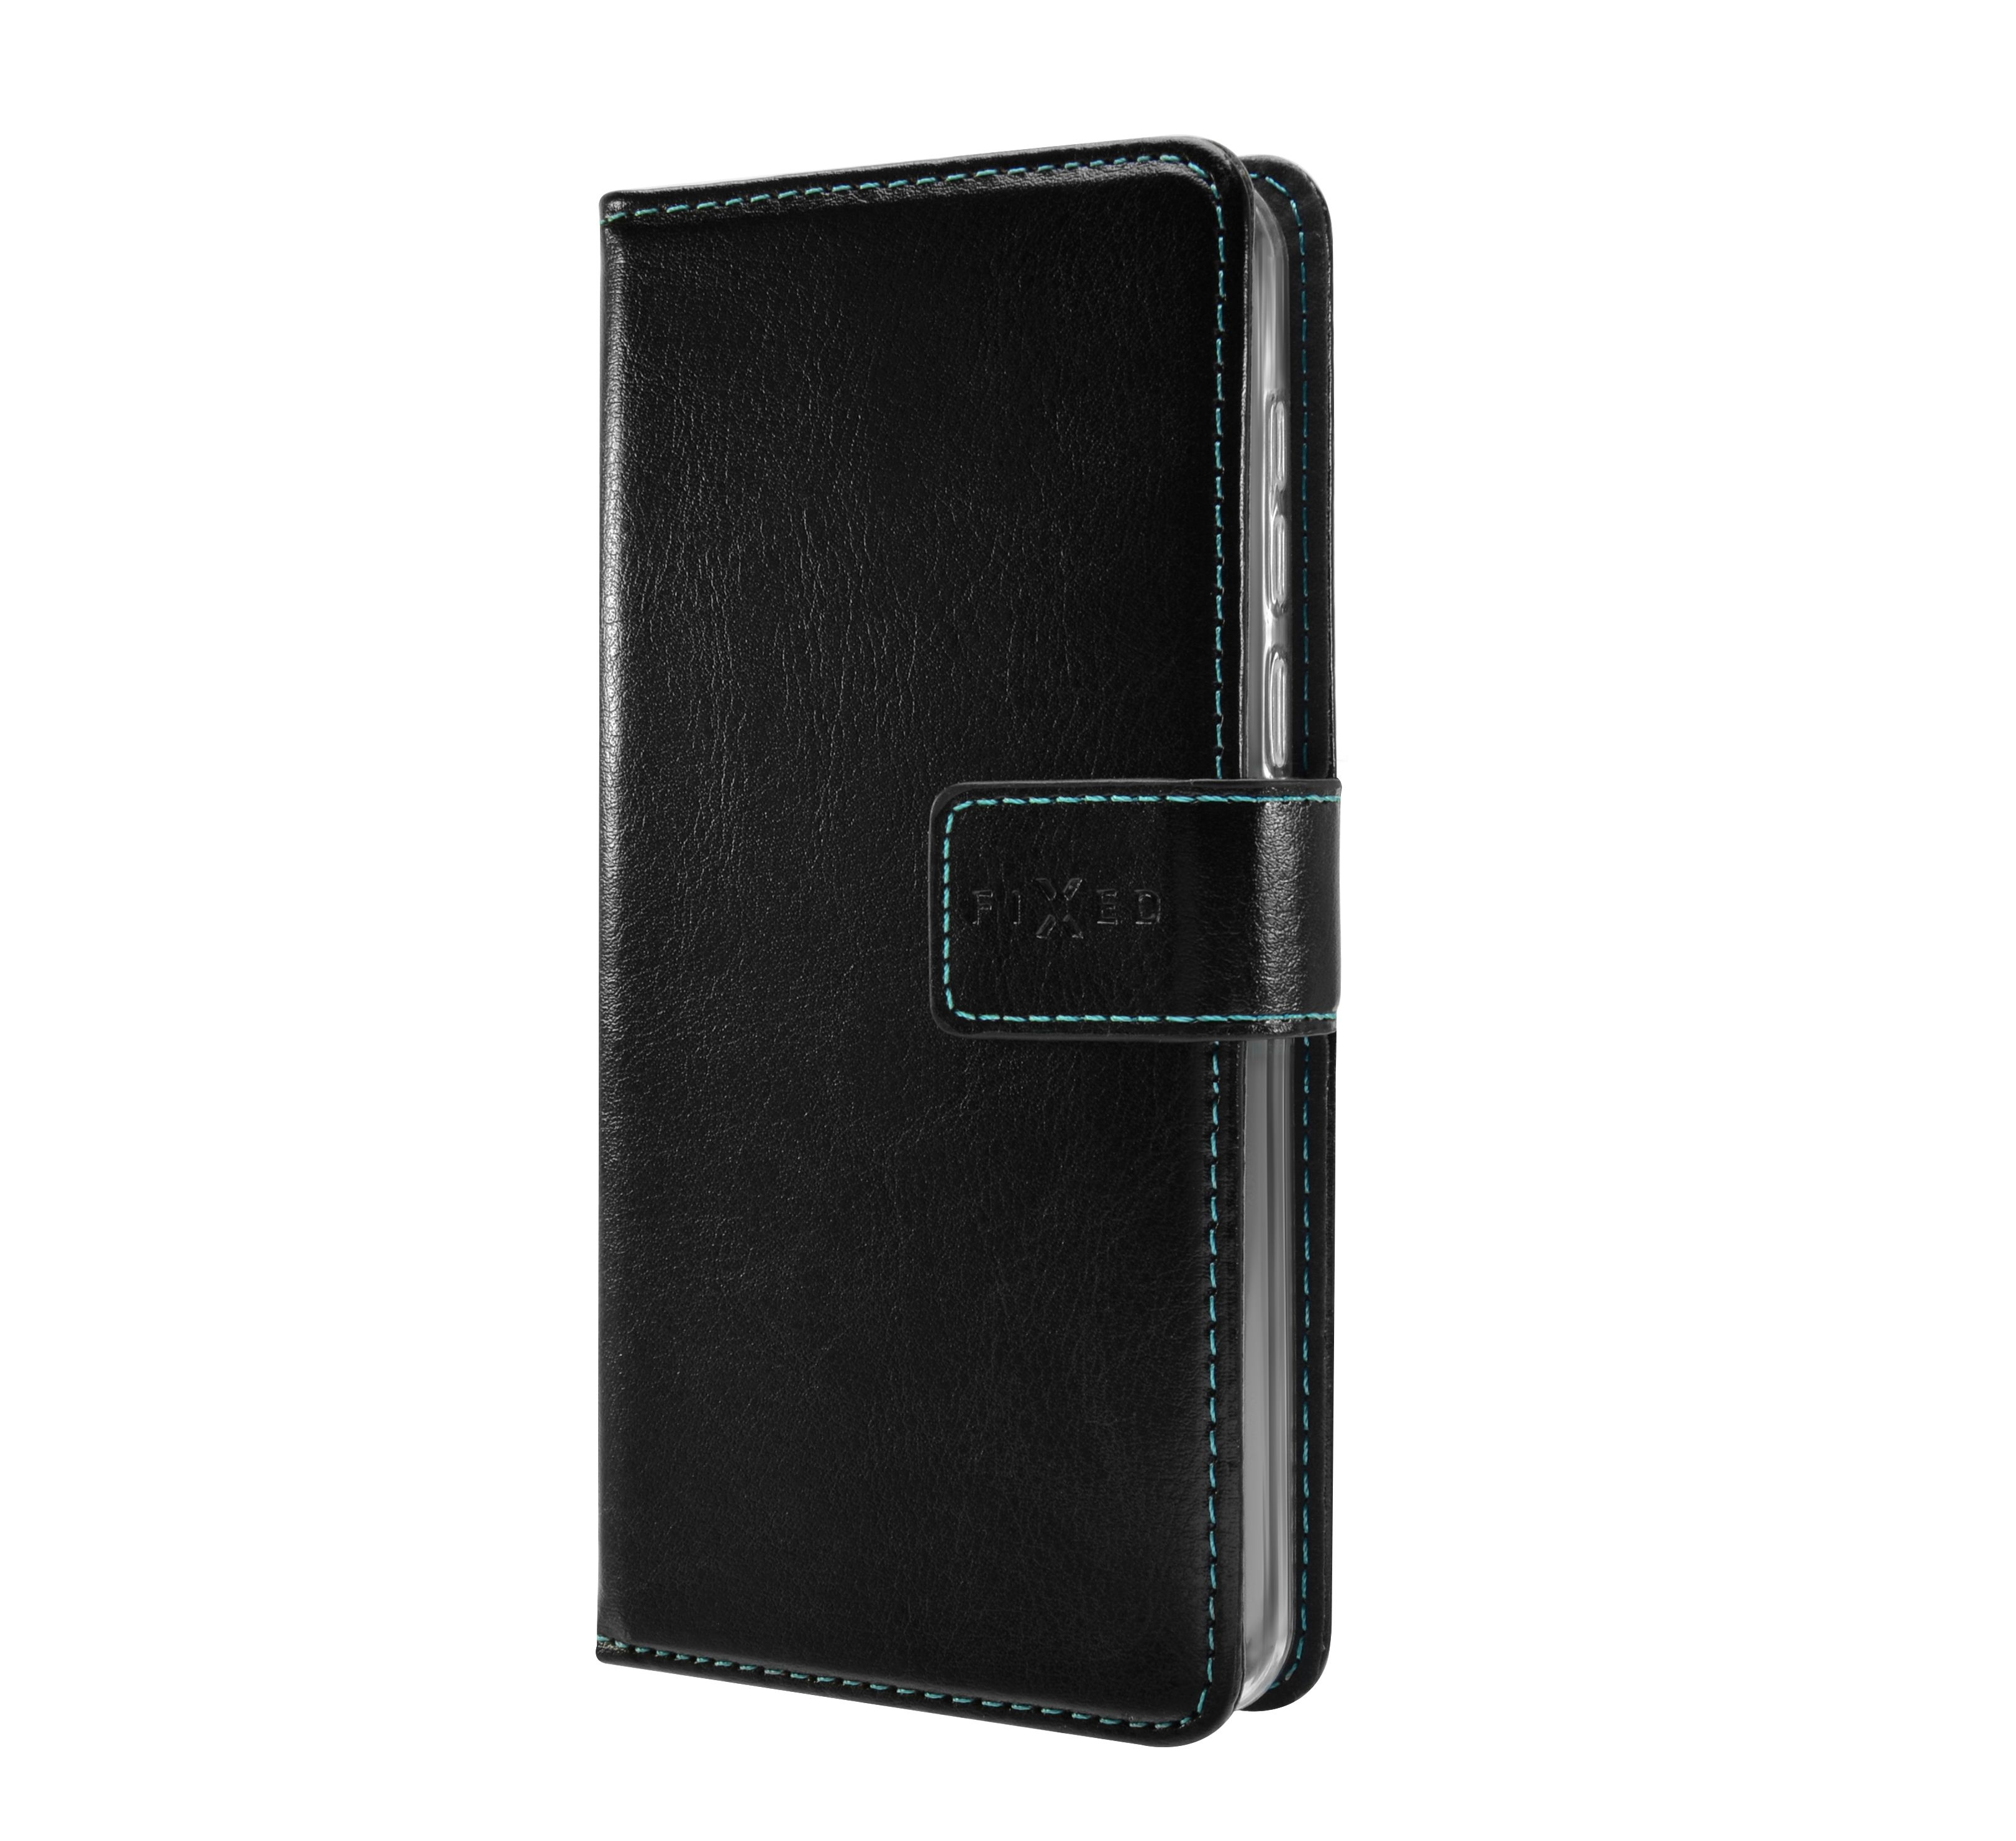 Pouzdro typu kniha FIXED Opus pro Xiaomi Mi Max 3 Global, černé